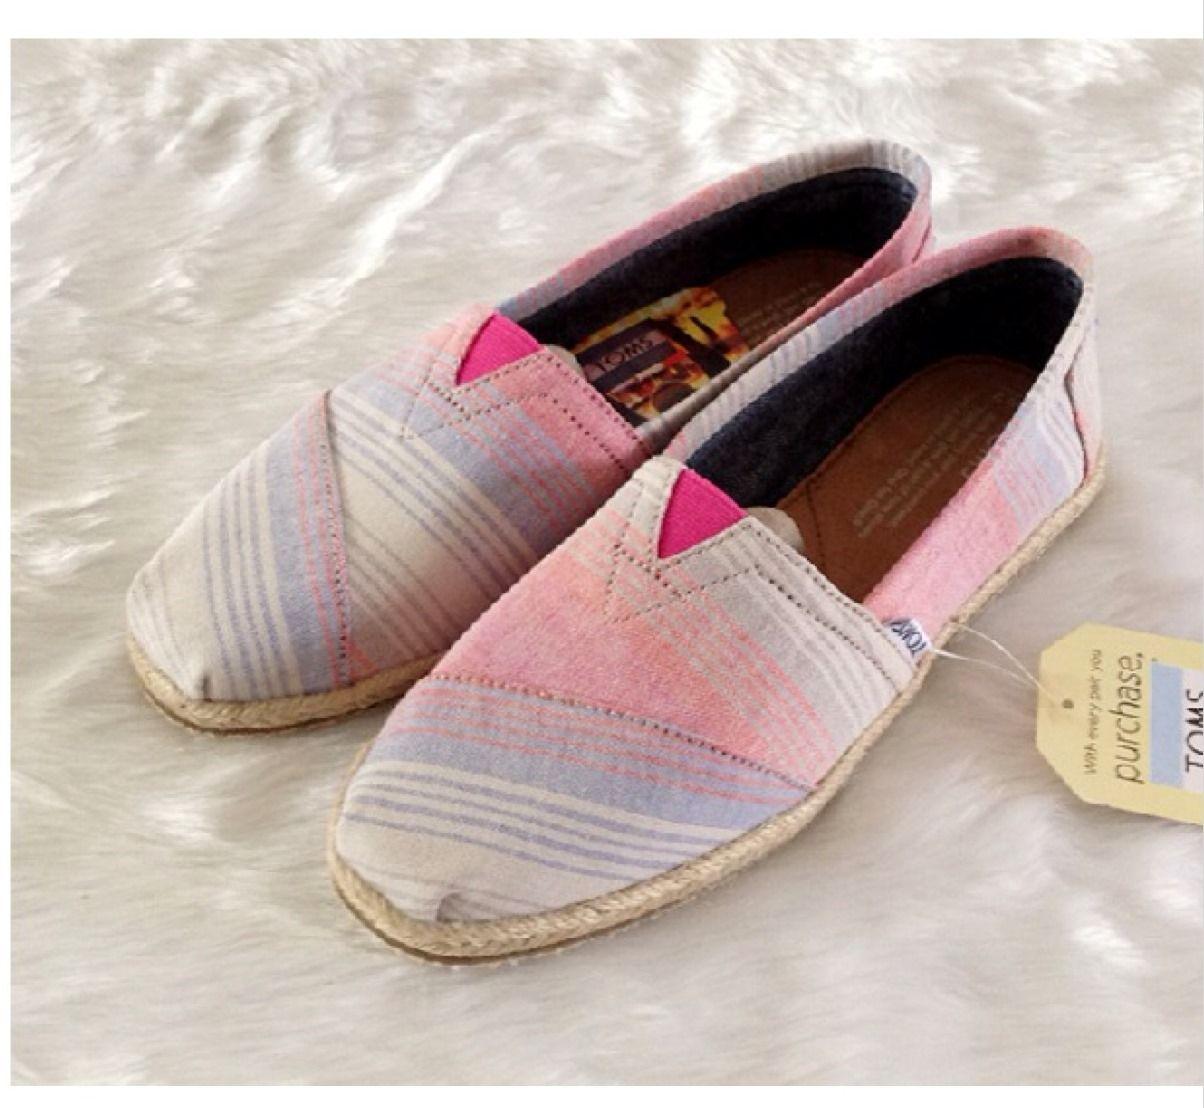 TOMS麻底漸層-粉紅色 / 尺寸:W US / 1300元